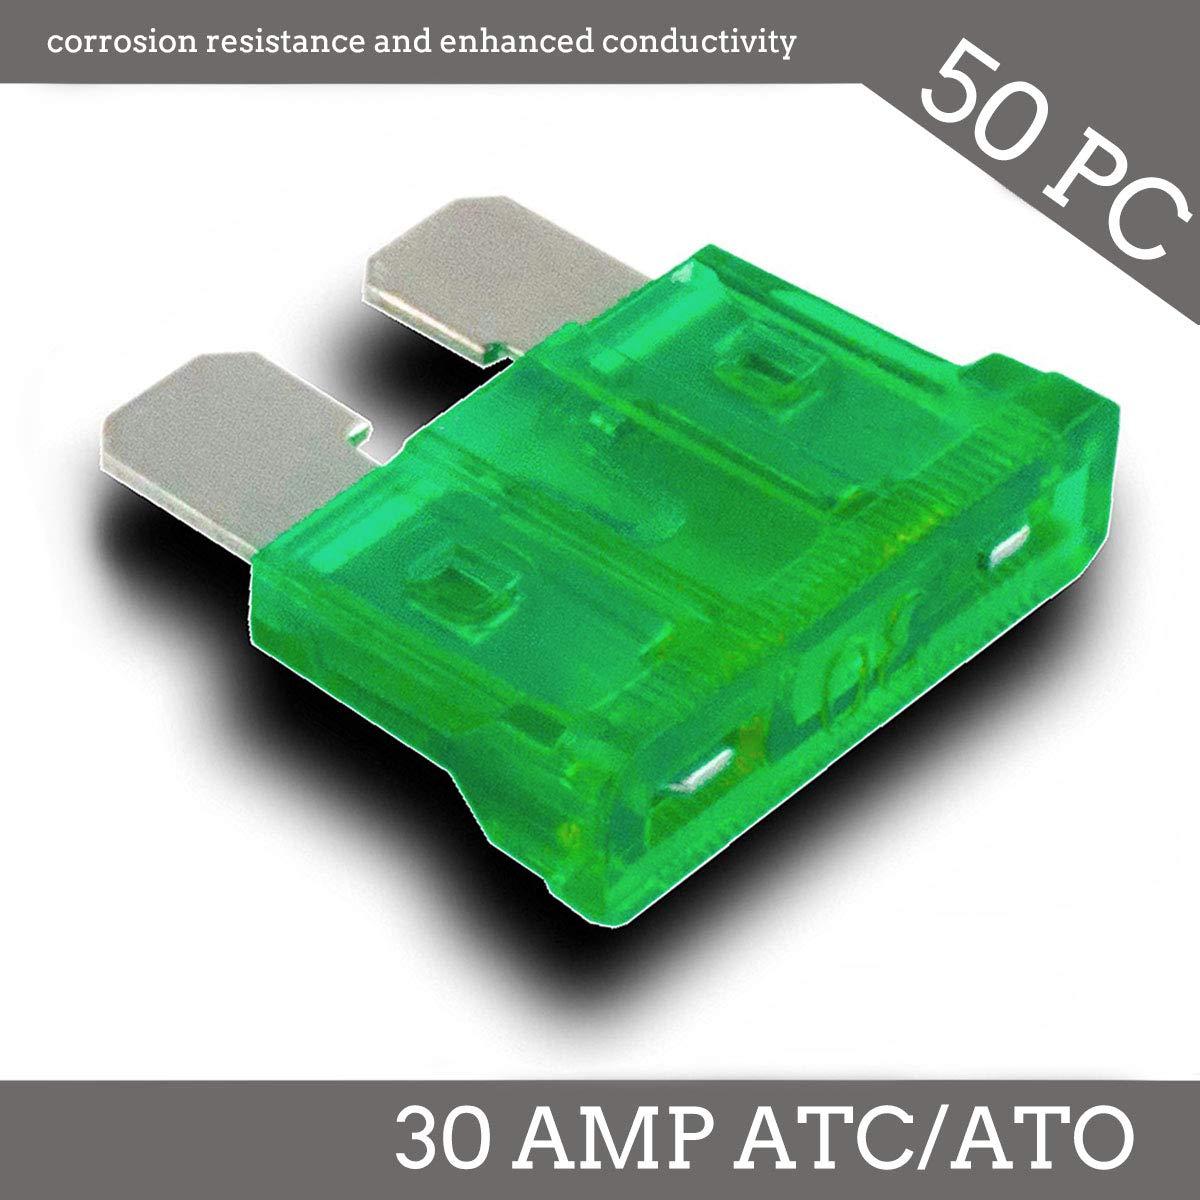 Deepa 50 Pack 30 AMP ATC//ATO Standard Regular Fuse Blade 30A Car Truck Boat Marine RV